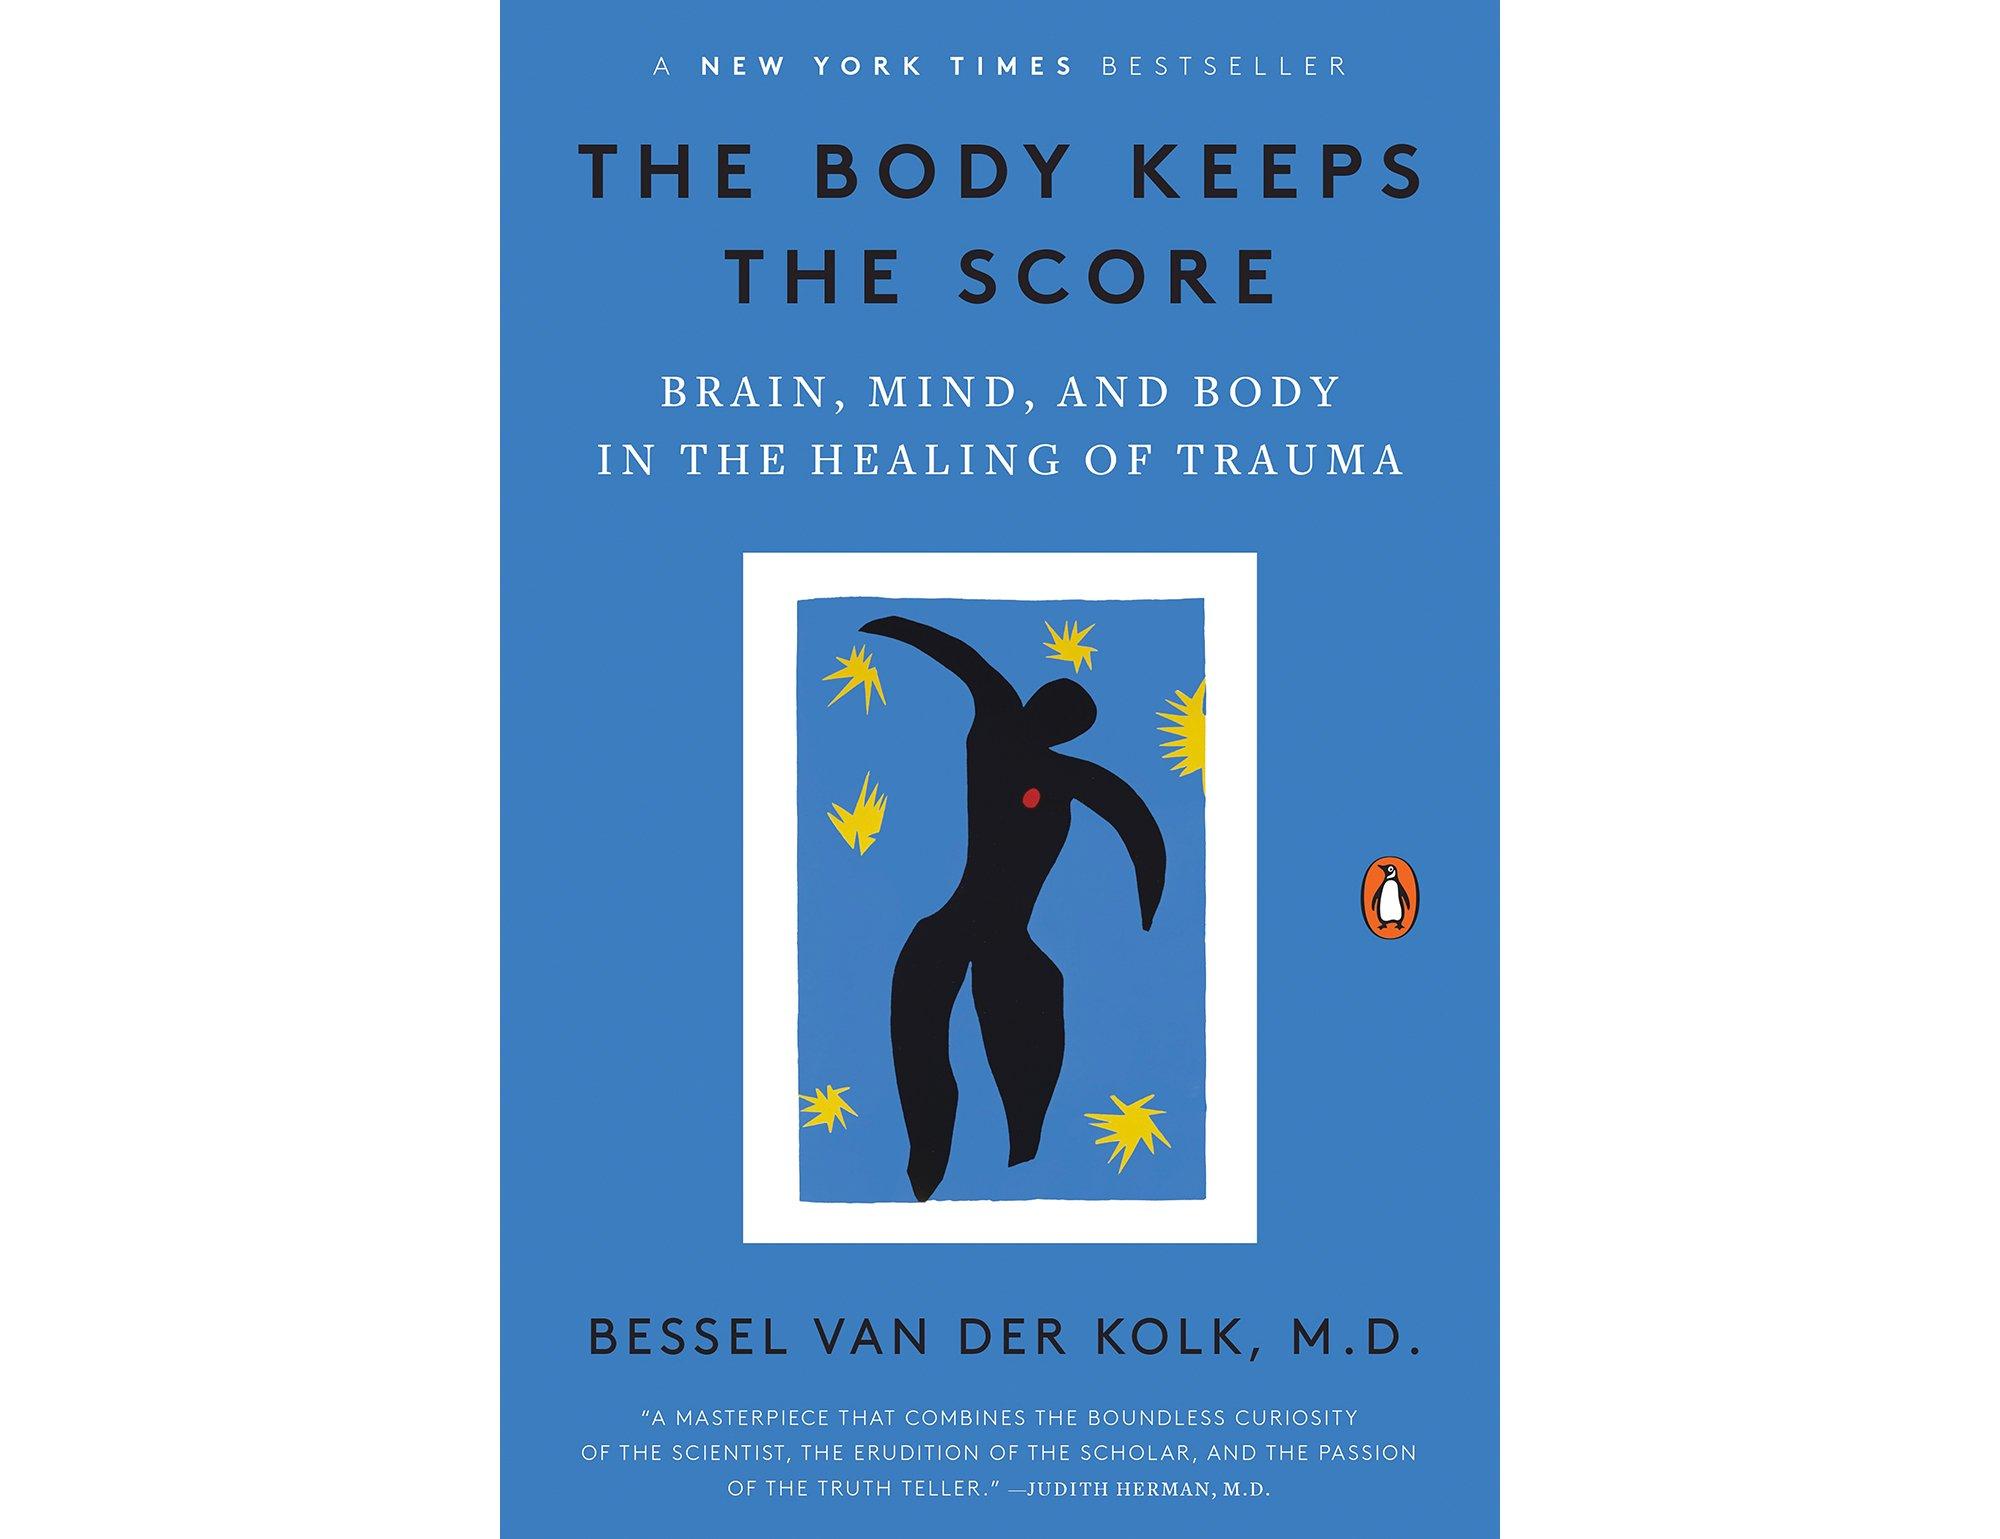 The cover of Bessel van der Kolk's The Body Keeps the Score